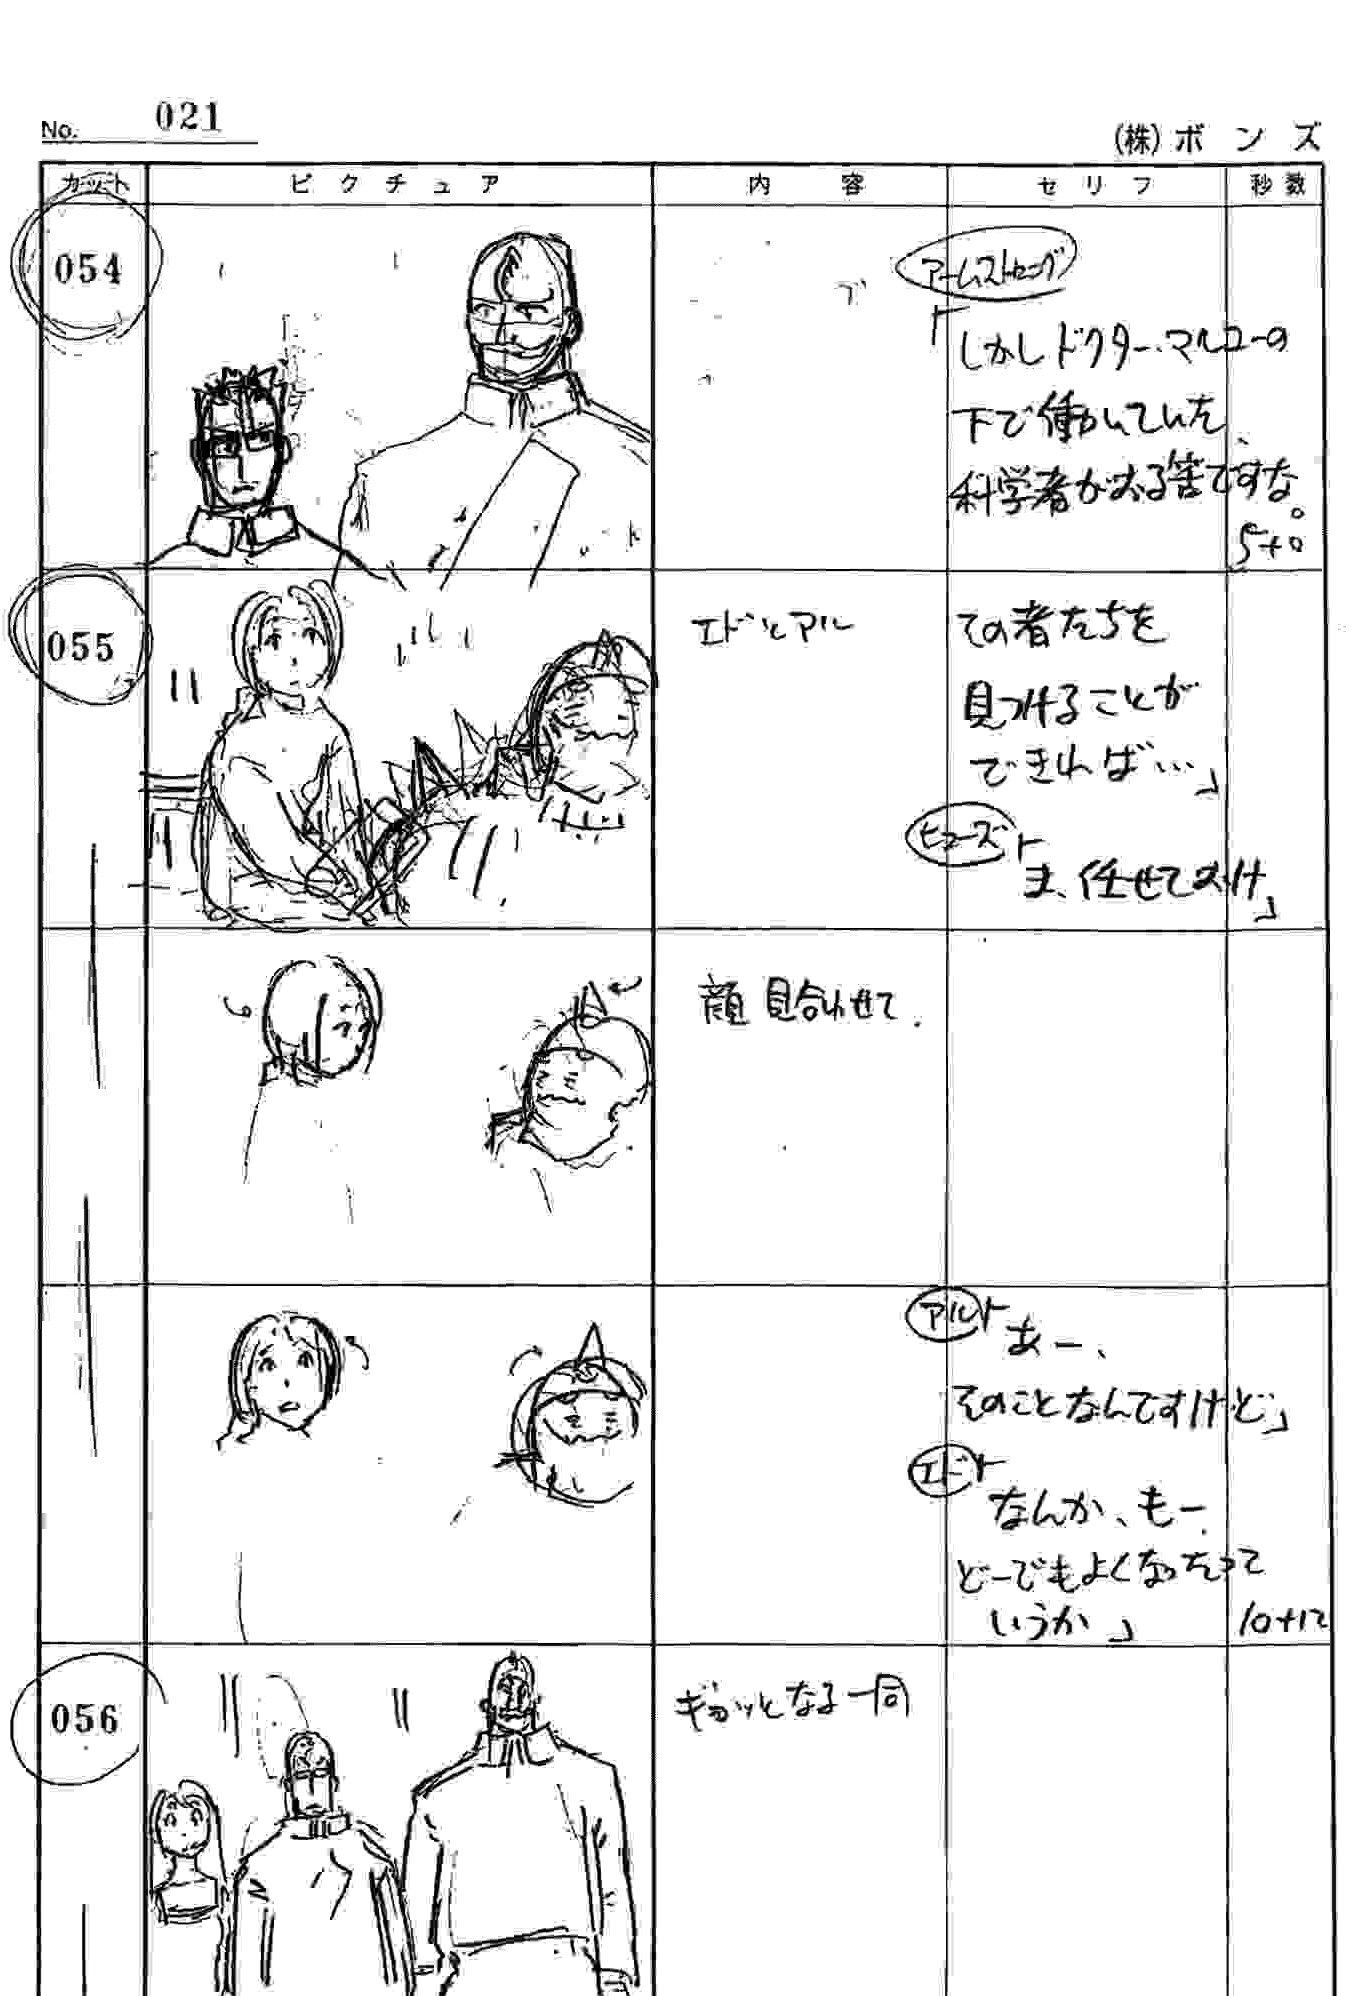 Une page du storyboard de la box collector de Fullmetal Alchemiist